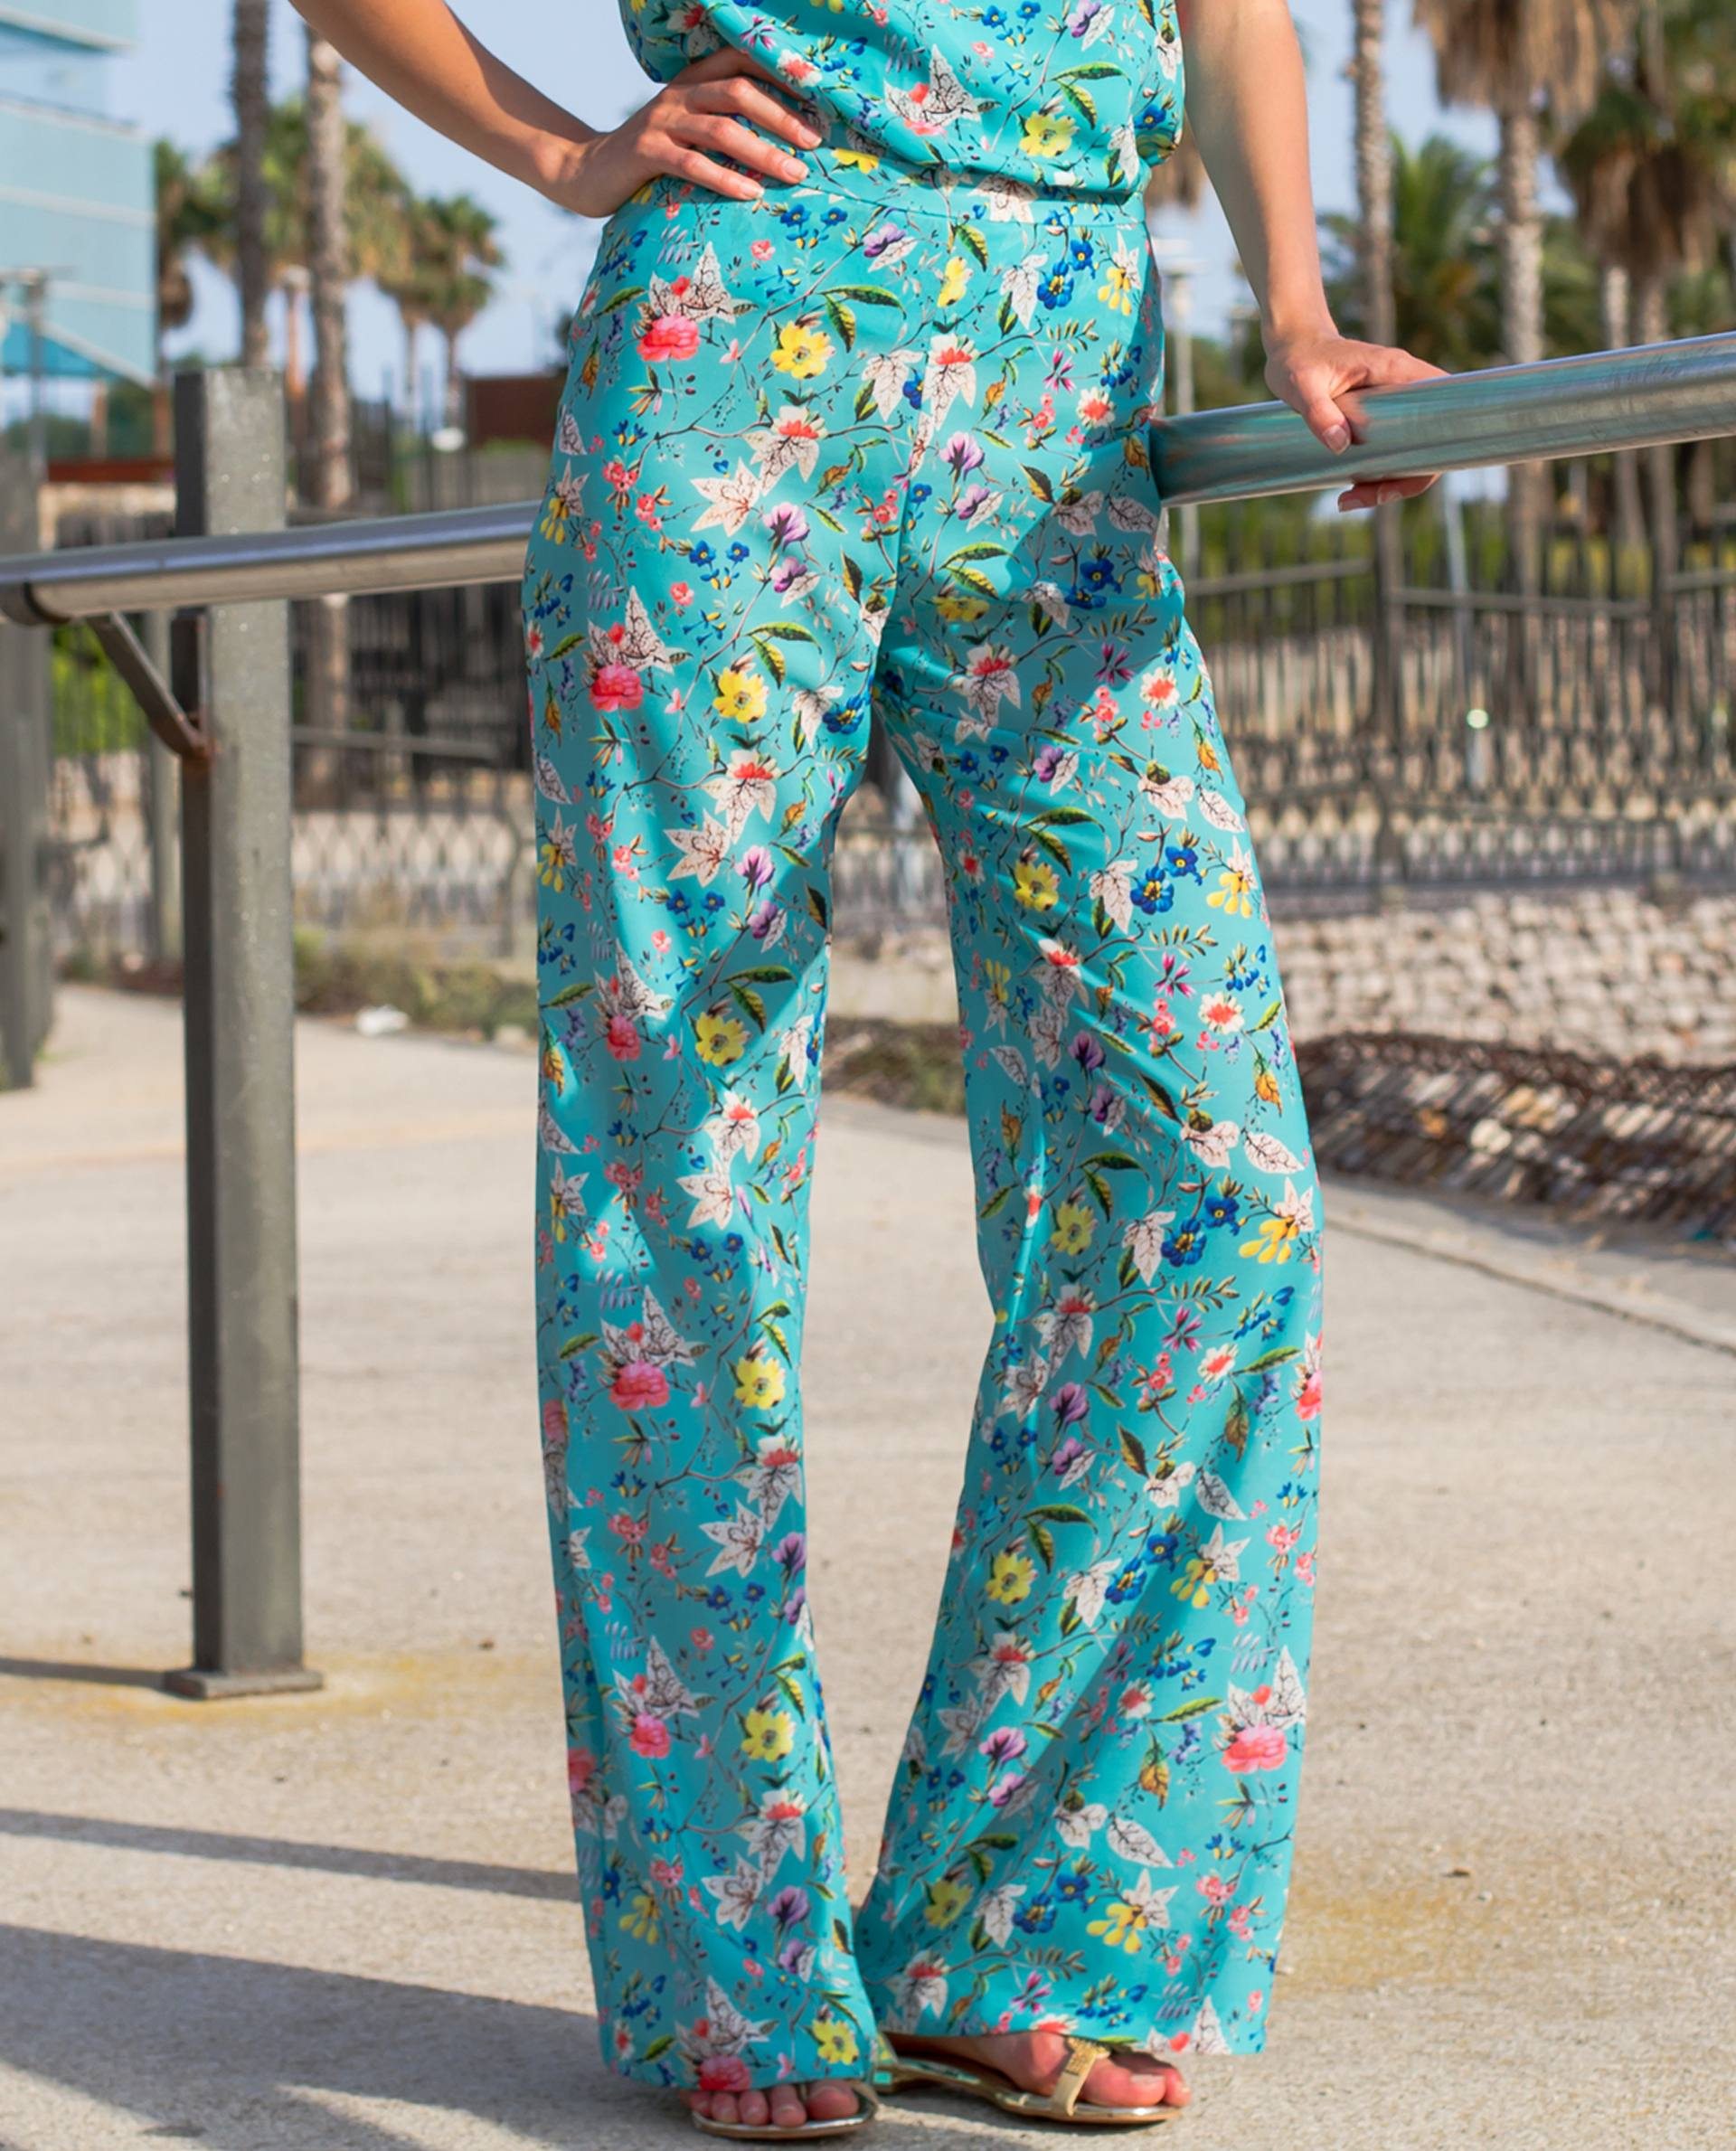 PRÊT À PORTER-OUTLET CÁPSULA SS18 - PANTALONES - Pantalón Rodas estampado azul